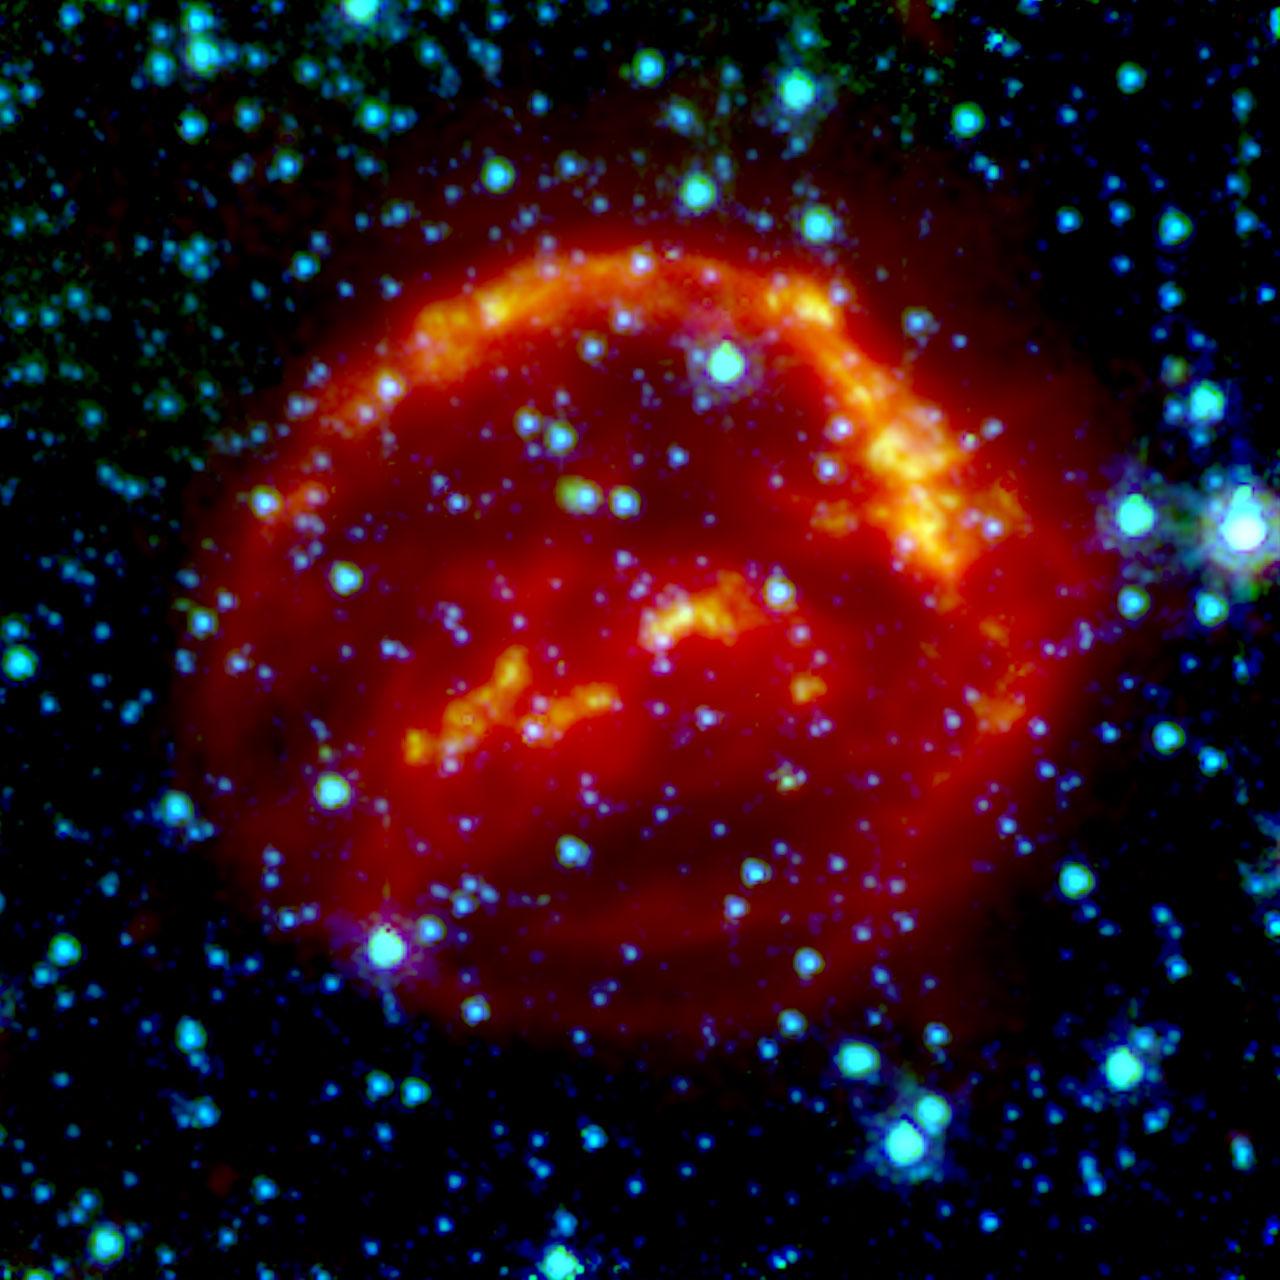 Spitzer Space Telescope: Kepler's Supernova Remnant (infrared data)